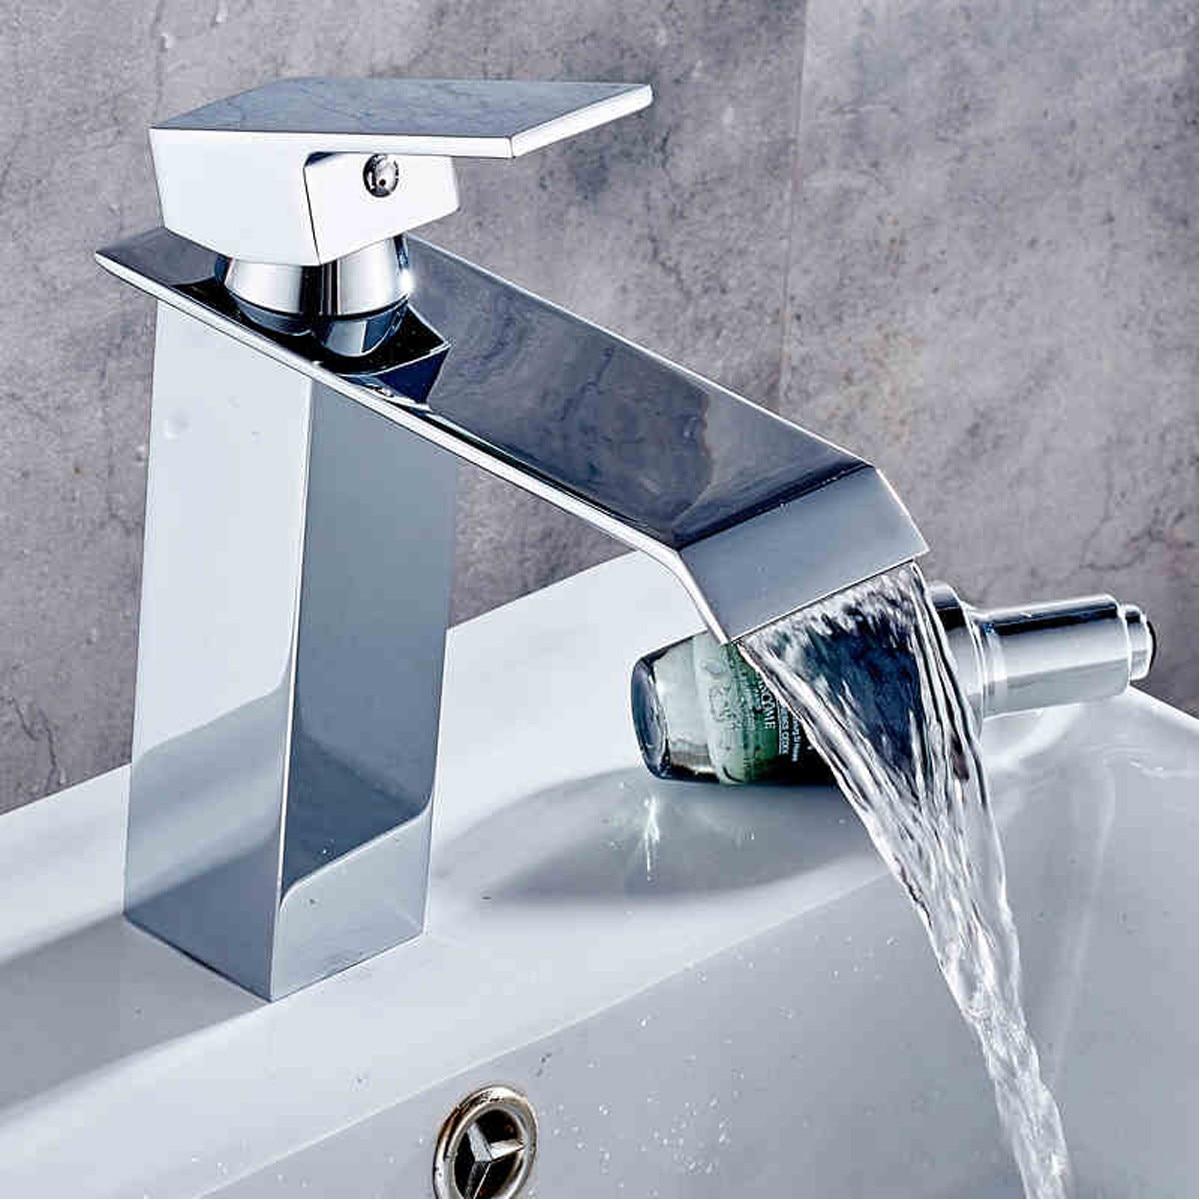 Basin Sink Faucet Bathroom Waterfall Mixer Widespread Chrome Polish Single Handle Single Hole Mixer Tap Deck Mounted FaucetBasin Sink Faucet Bathroom Waterfall Mixer Widespread Chrome Polish Single Handle Single Hole Mixer Tap Deck Mounted Faucet